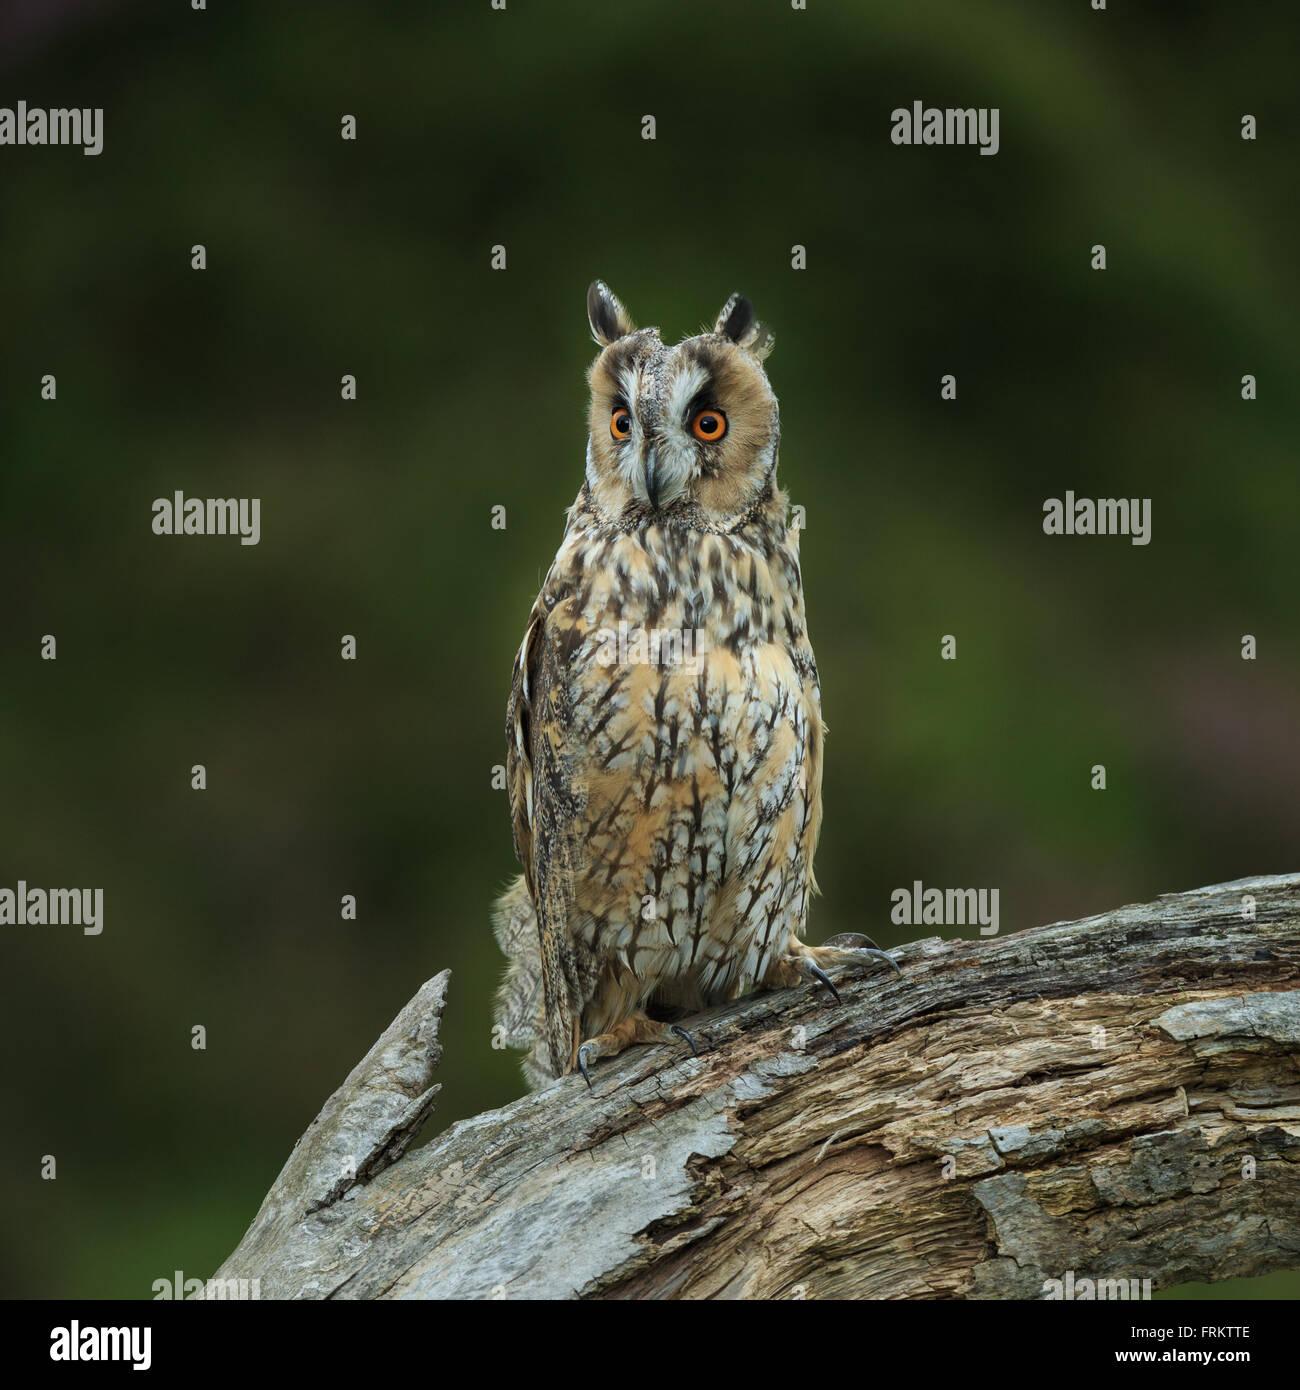 Long-eared owl (Asio otus) - Stock Image